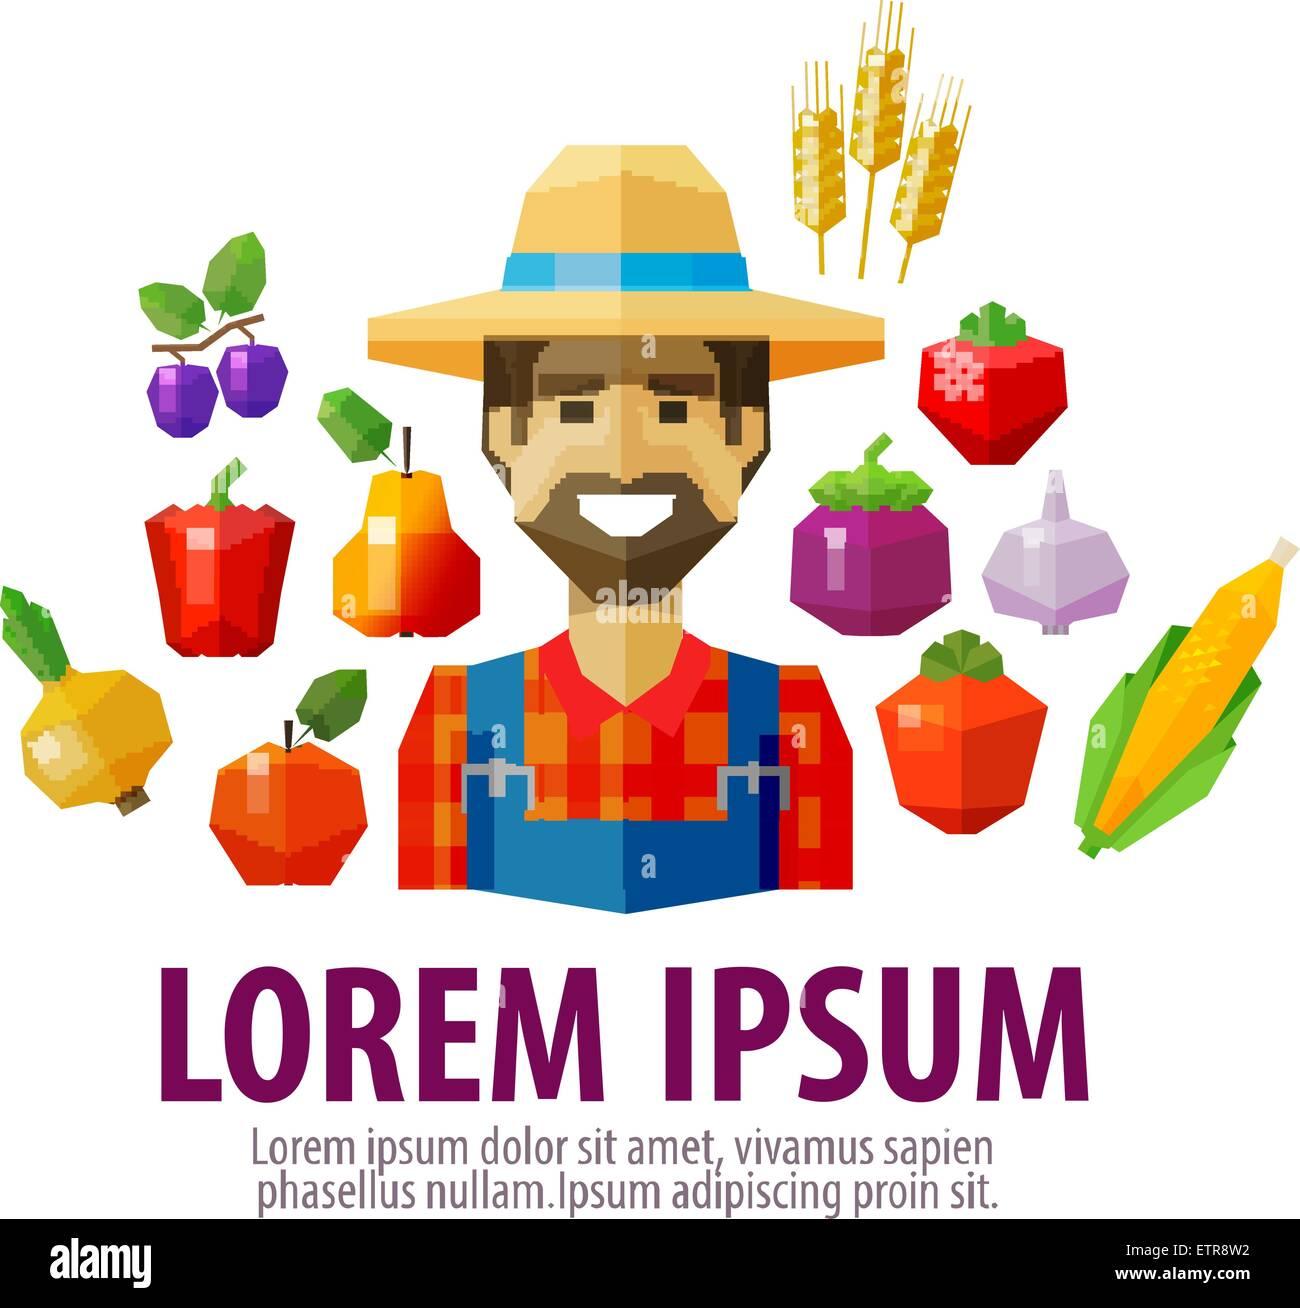 farmer vector logo design template. harvest or agriculture, farming icon - Stock Image